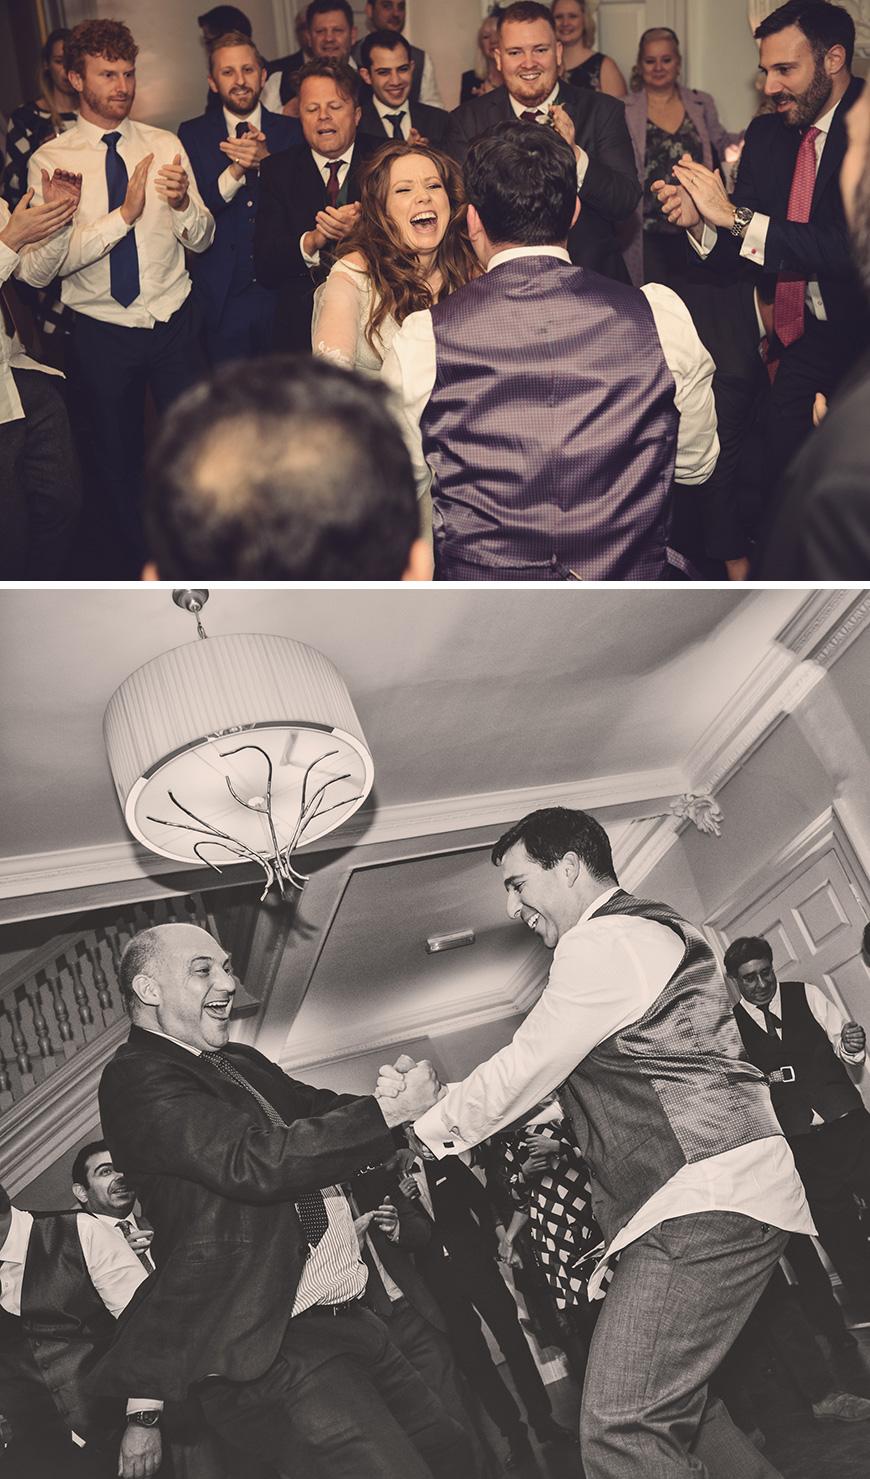 Real Wedding - Candice and Rael's Elegant Winter Wedding at Morden Hall | CHWV